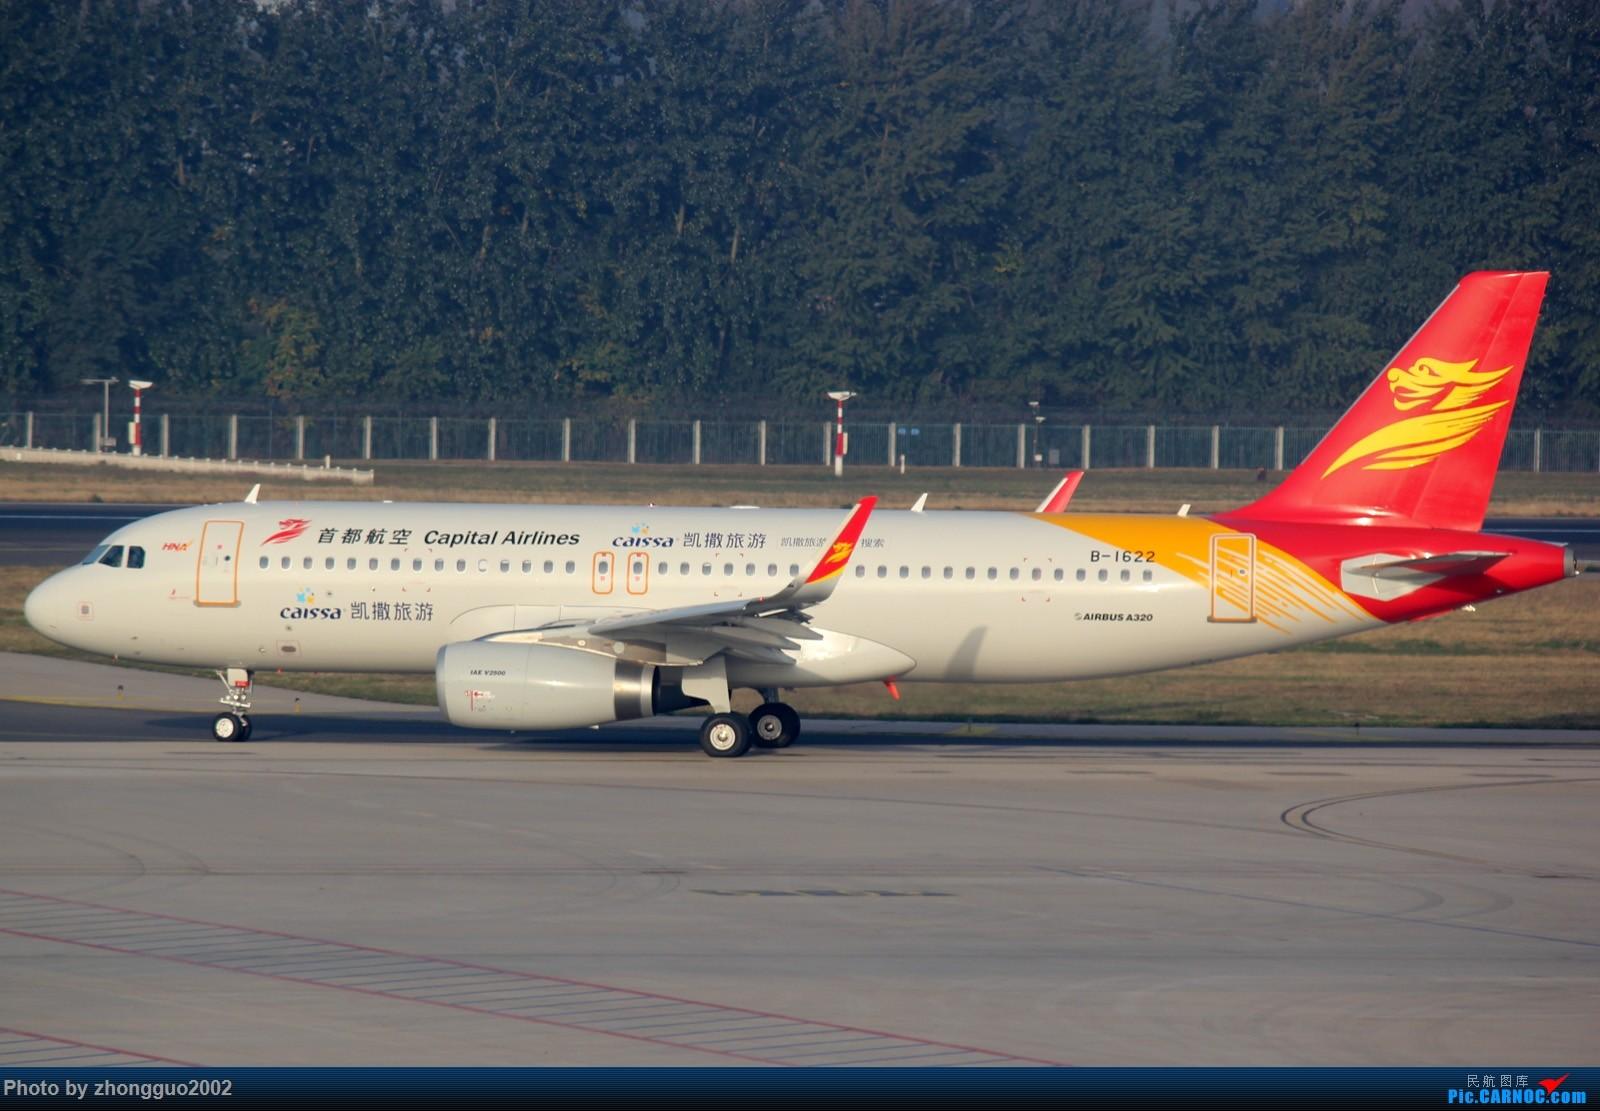 Re:[原创]【BLDDQ--深圳打机队】发小飞机盖楼贴,凡跟帖1字开头大陆民航飞机图的,每图五架小飞机不重复 AIRBUS A320-200 B-1622 中国北京首都国际机场